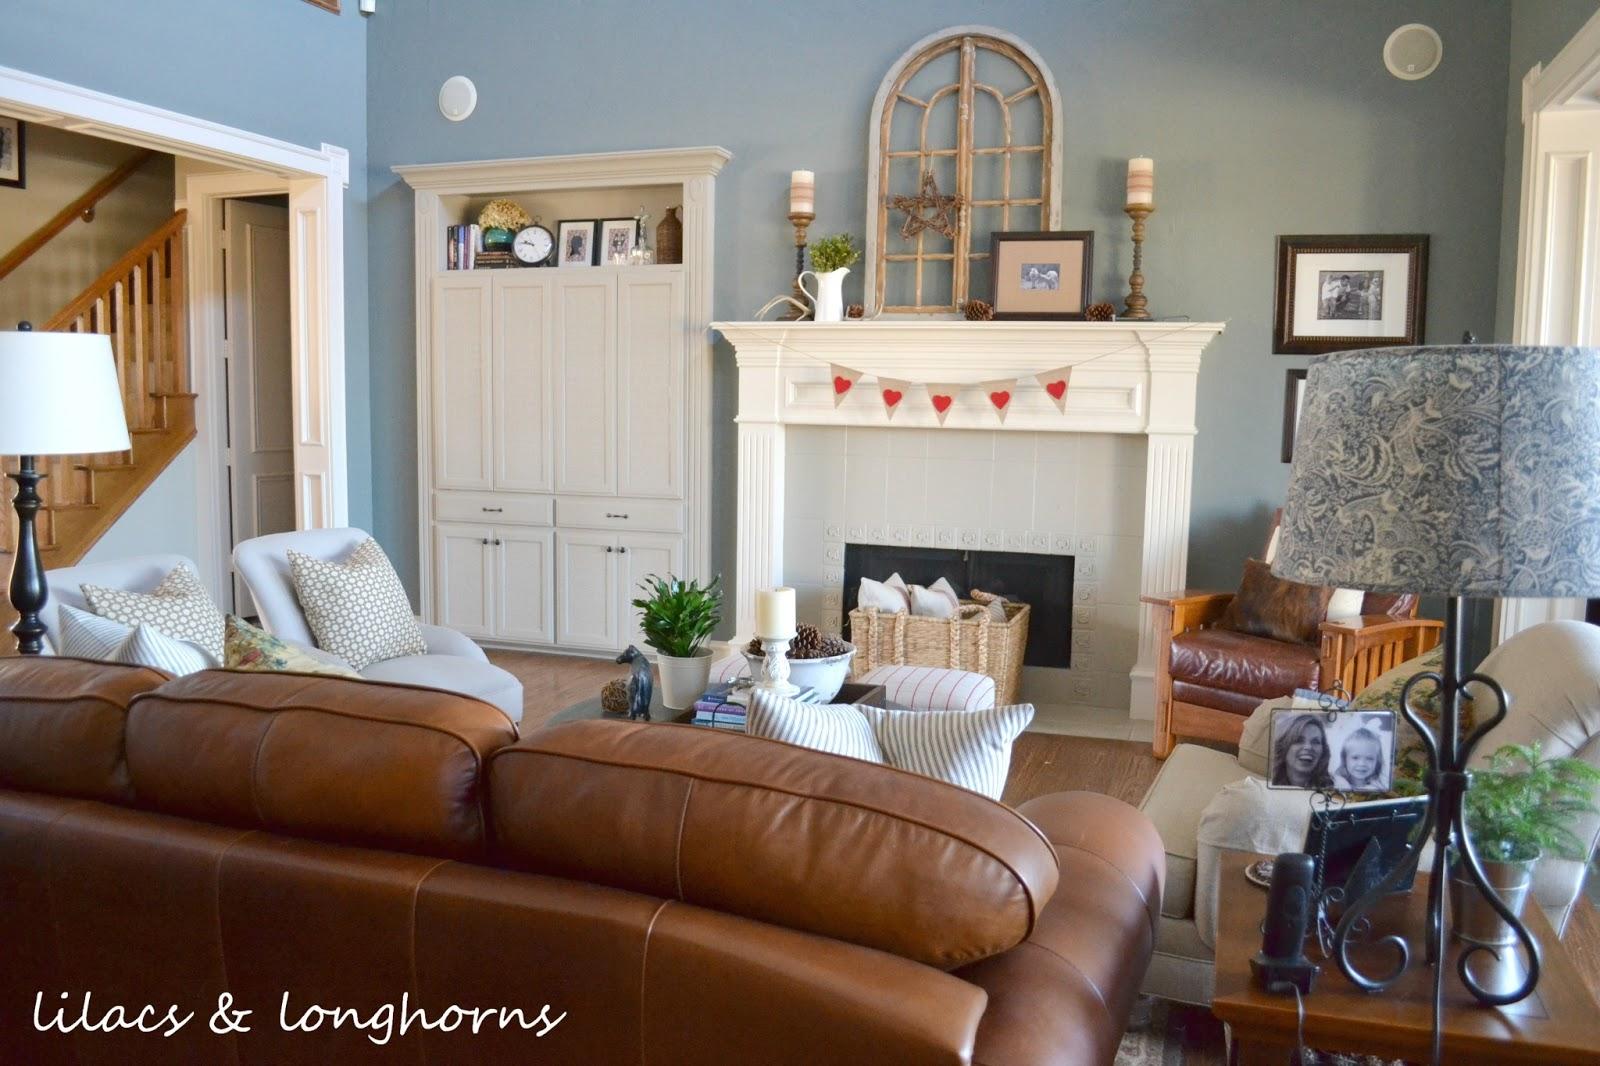 Surprising How To Cover A Leather Sofa With Fabric Creativecarmelina Interior Chair Design Creativecarmelinacom